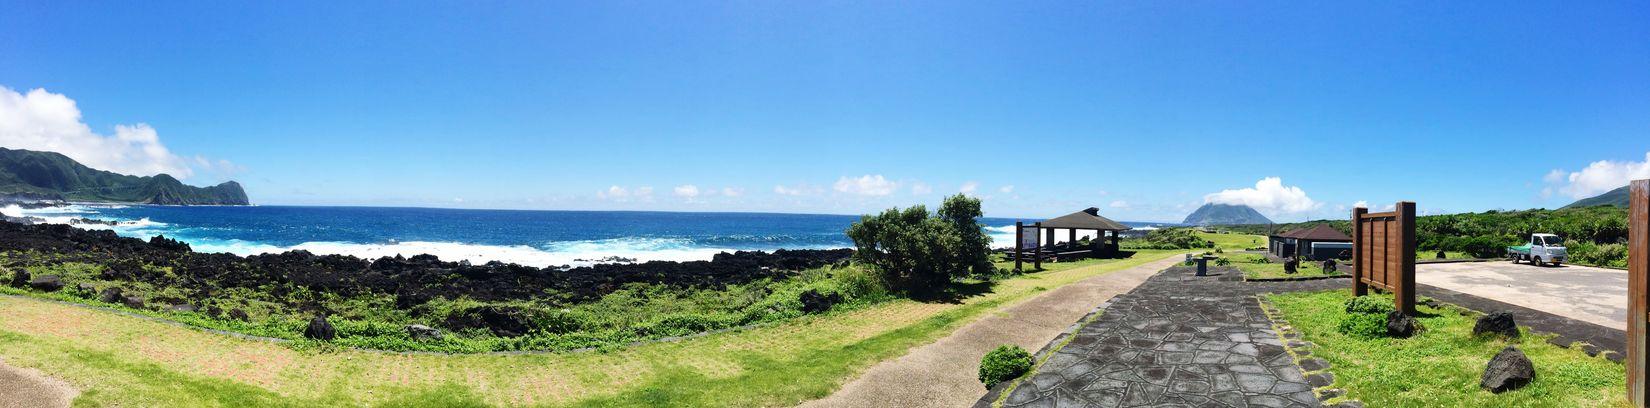 IPhone Tokyo Hachijo-island OpenEdit 八丈島 Cloud 八丈小島 Sea Blue Sky Sky